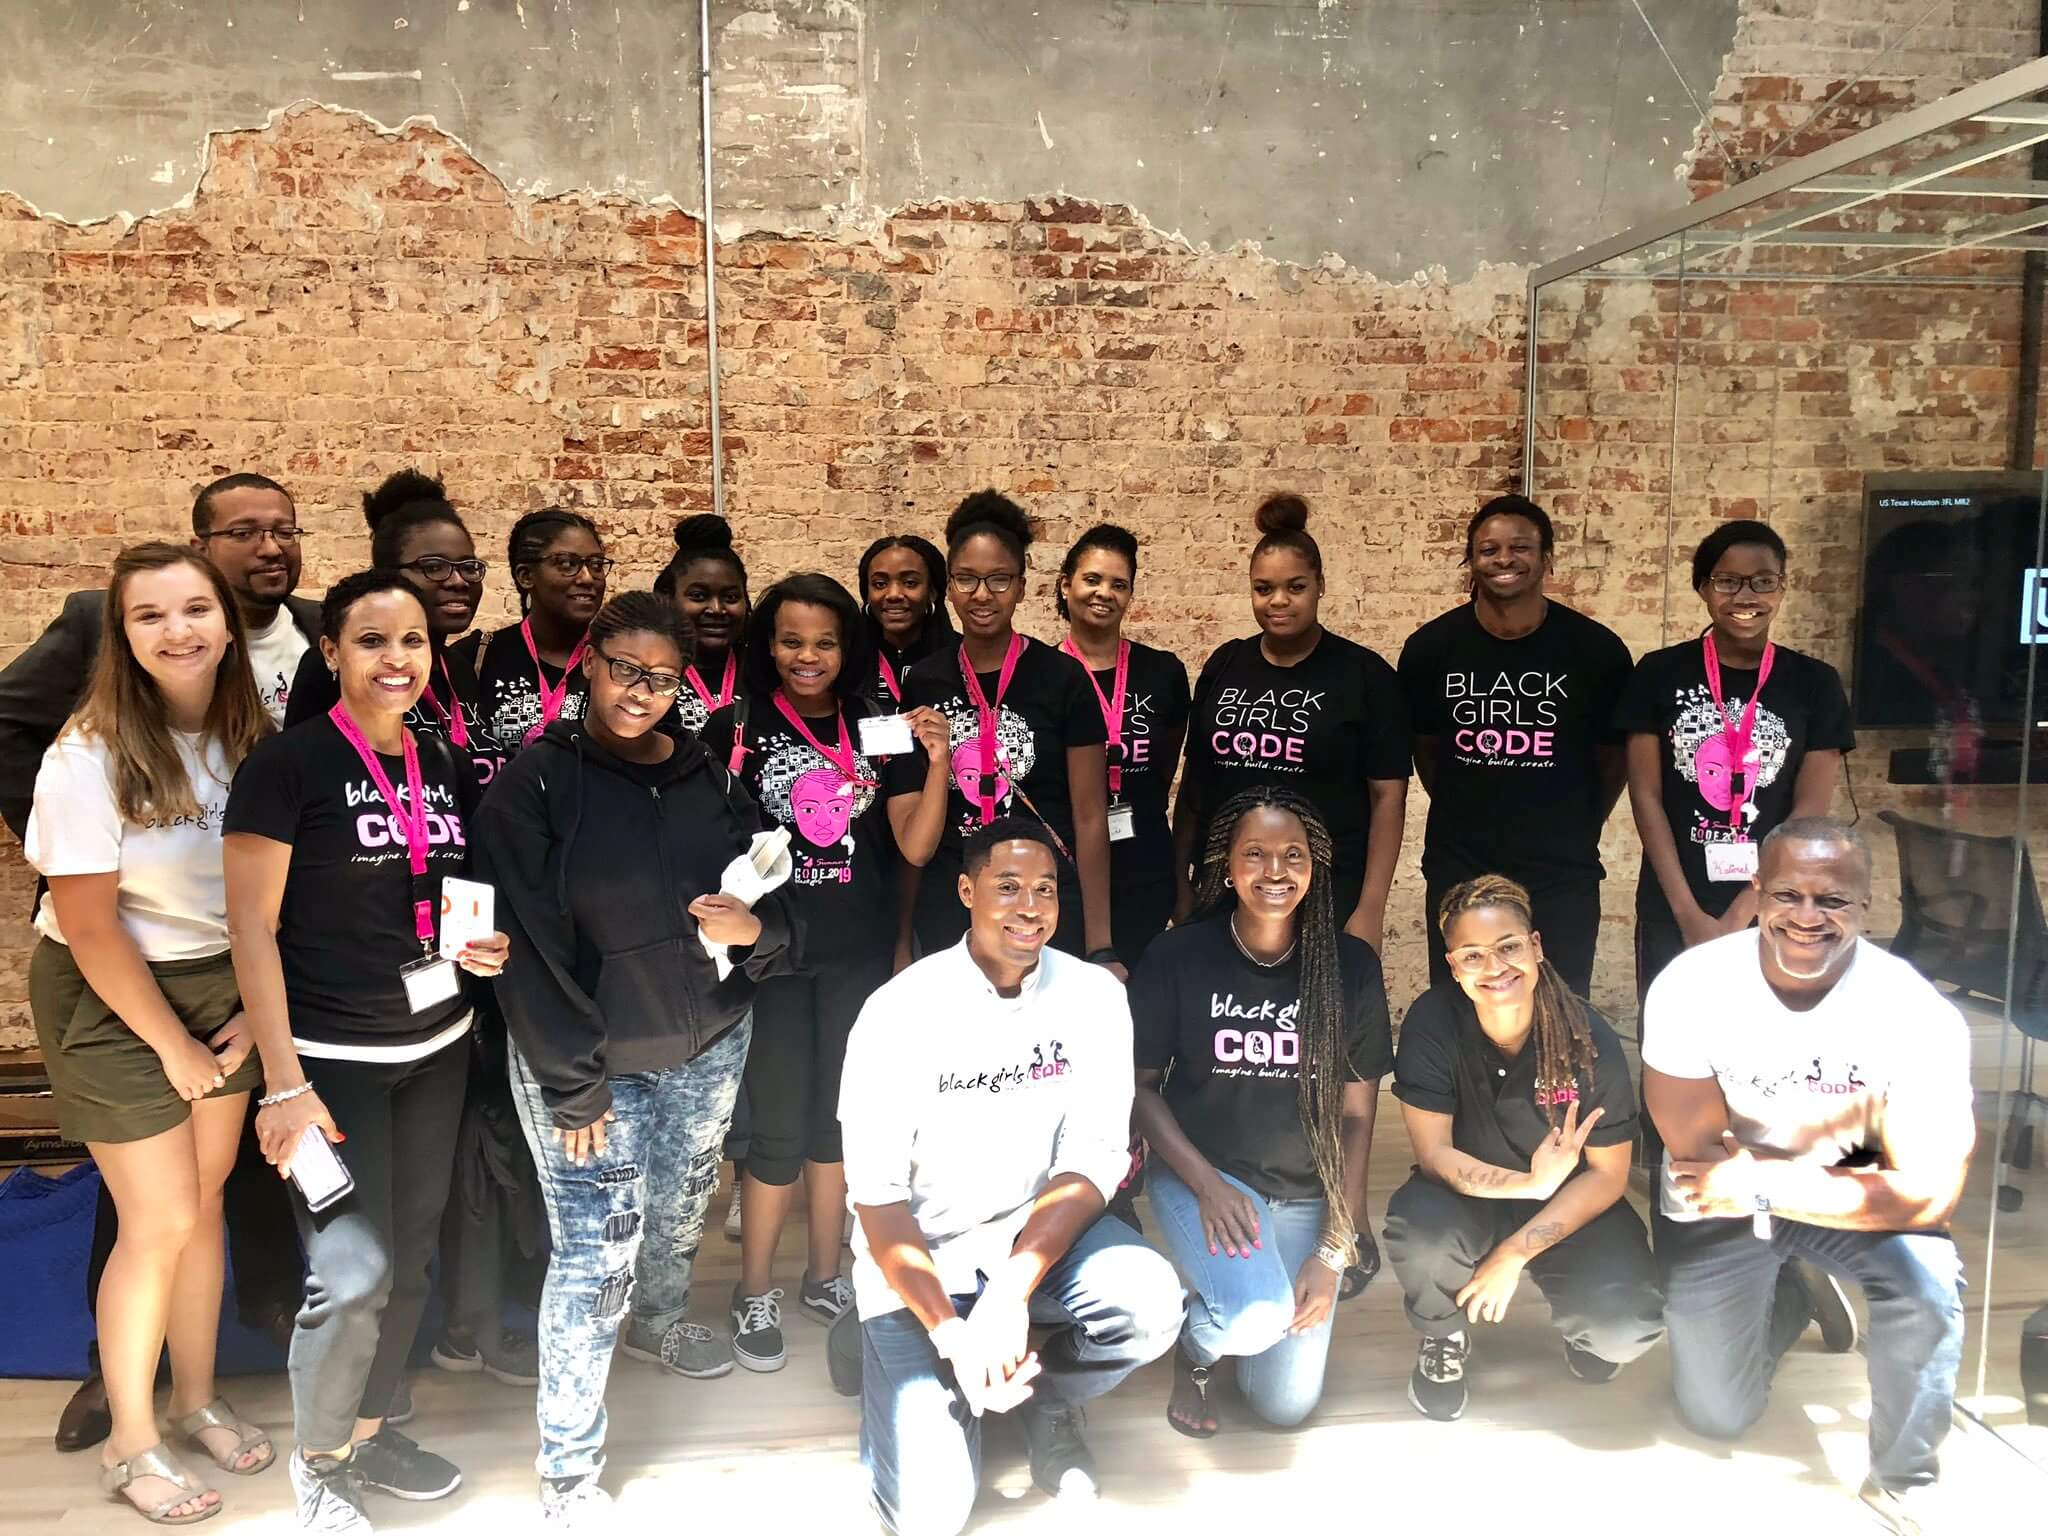 black girls code visit uipath houston office